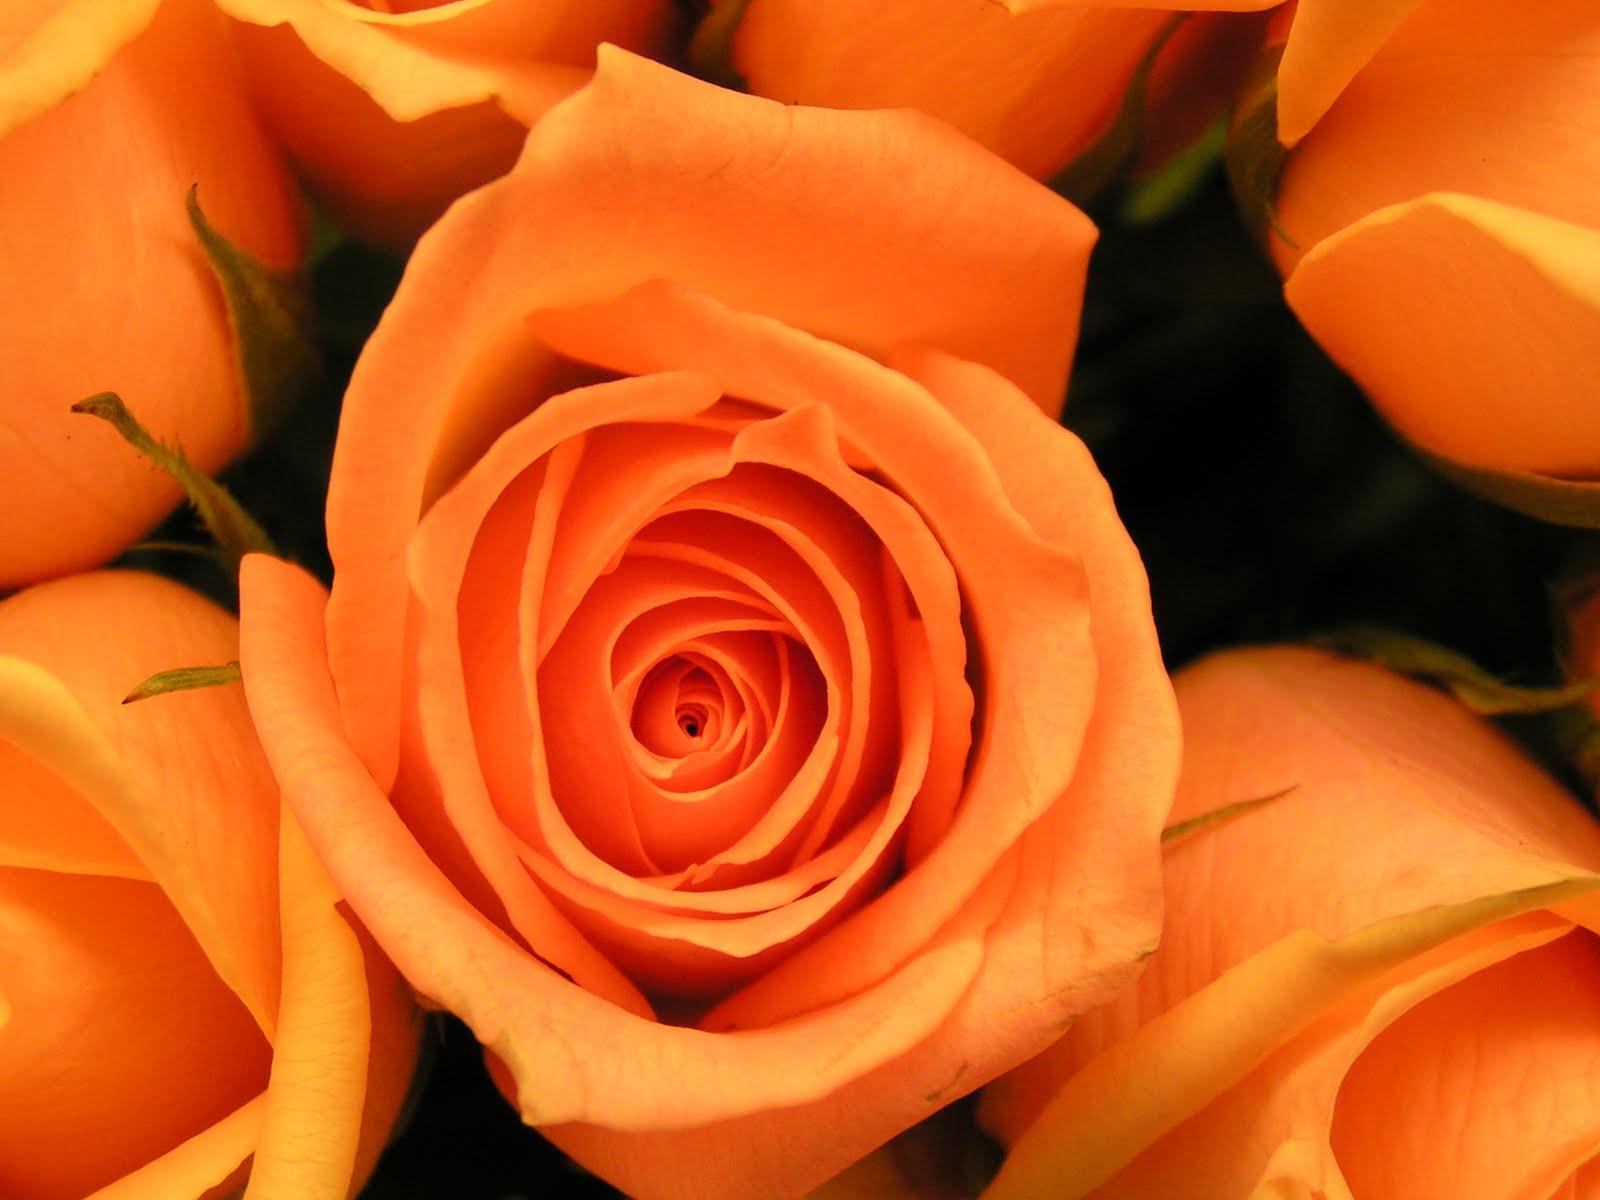 Orange Roses Wallpaper Download Wallpapers 1600x1200px